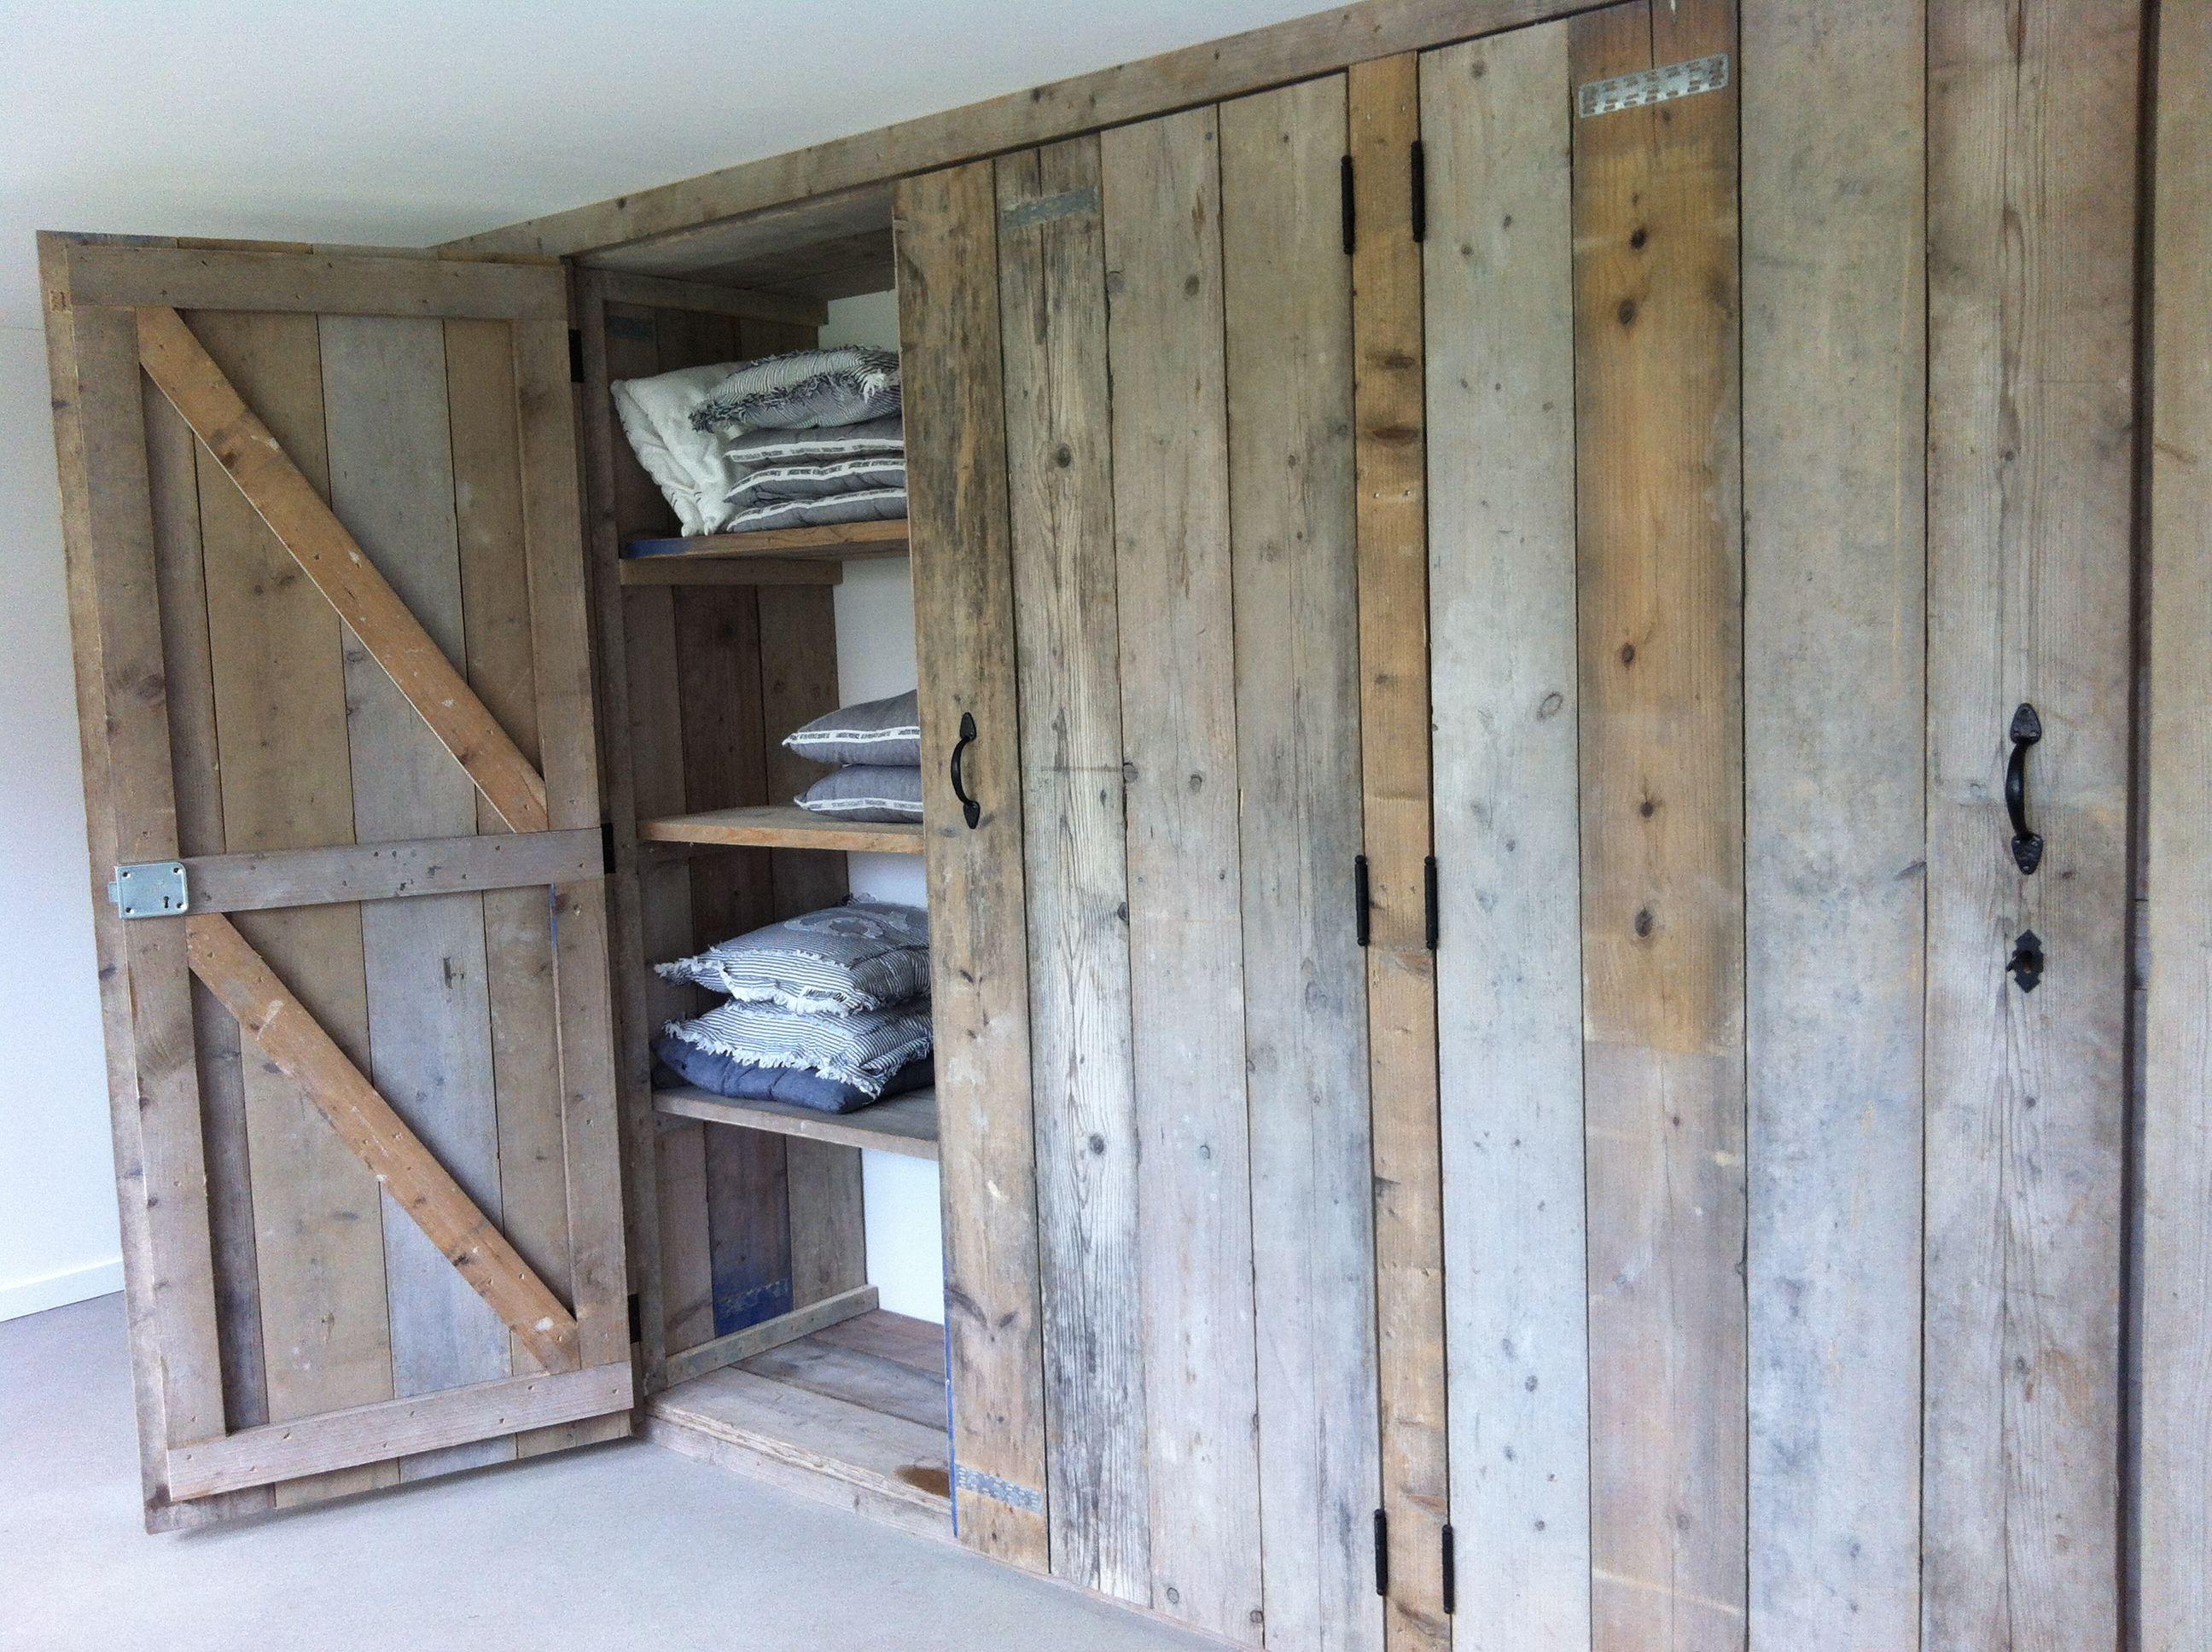 kastenwand steigerhout made by klusbedrijfjitzeveldstra kastdeuren kastdeuren slaapkamer garderobe inloopkast slaapkamer